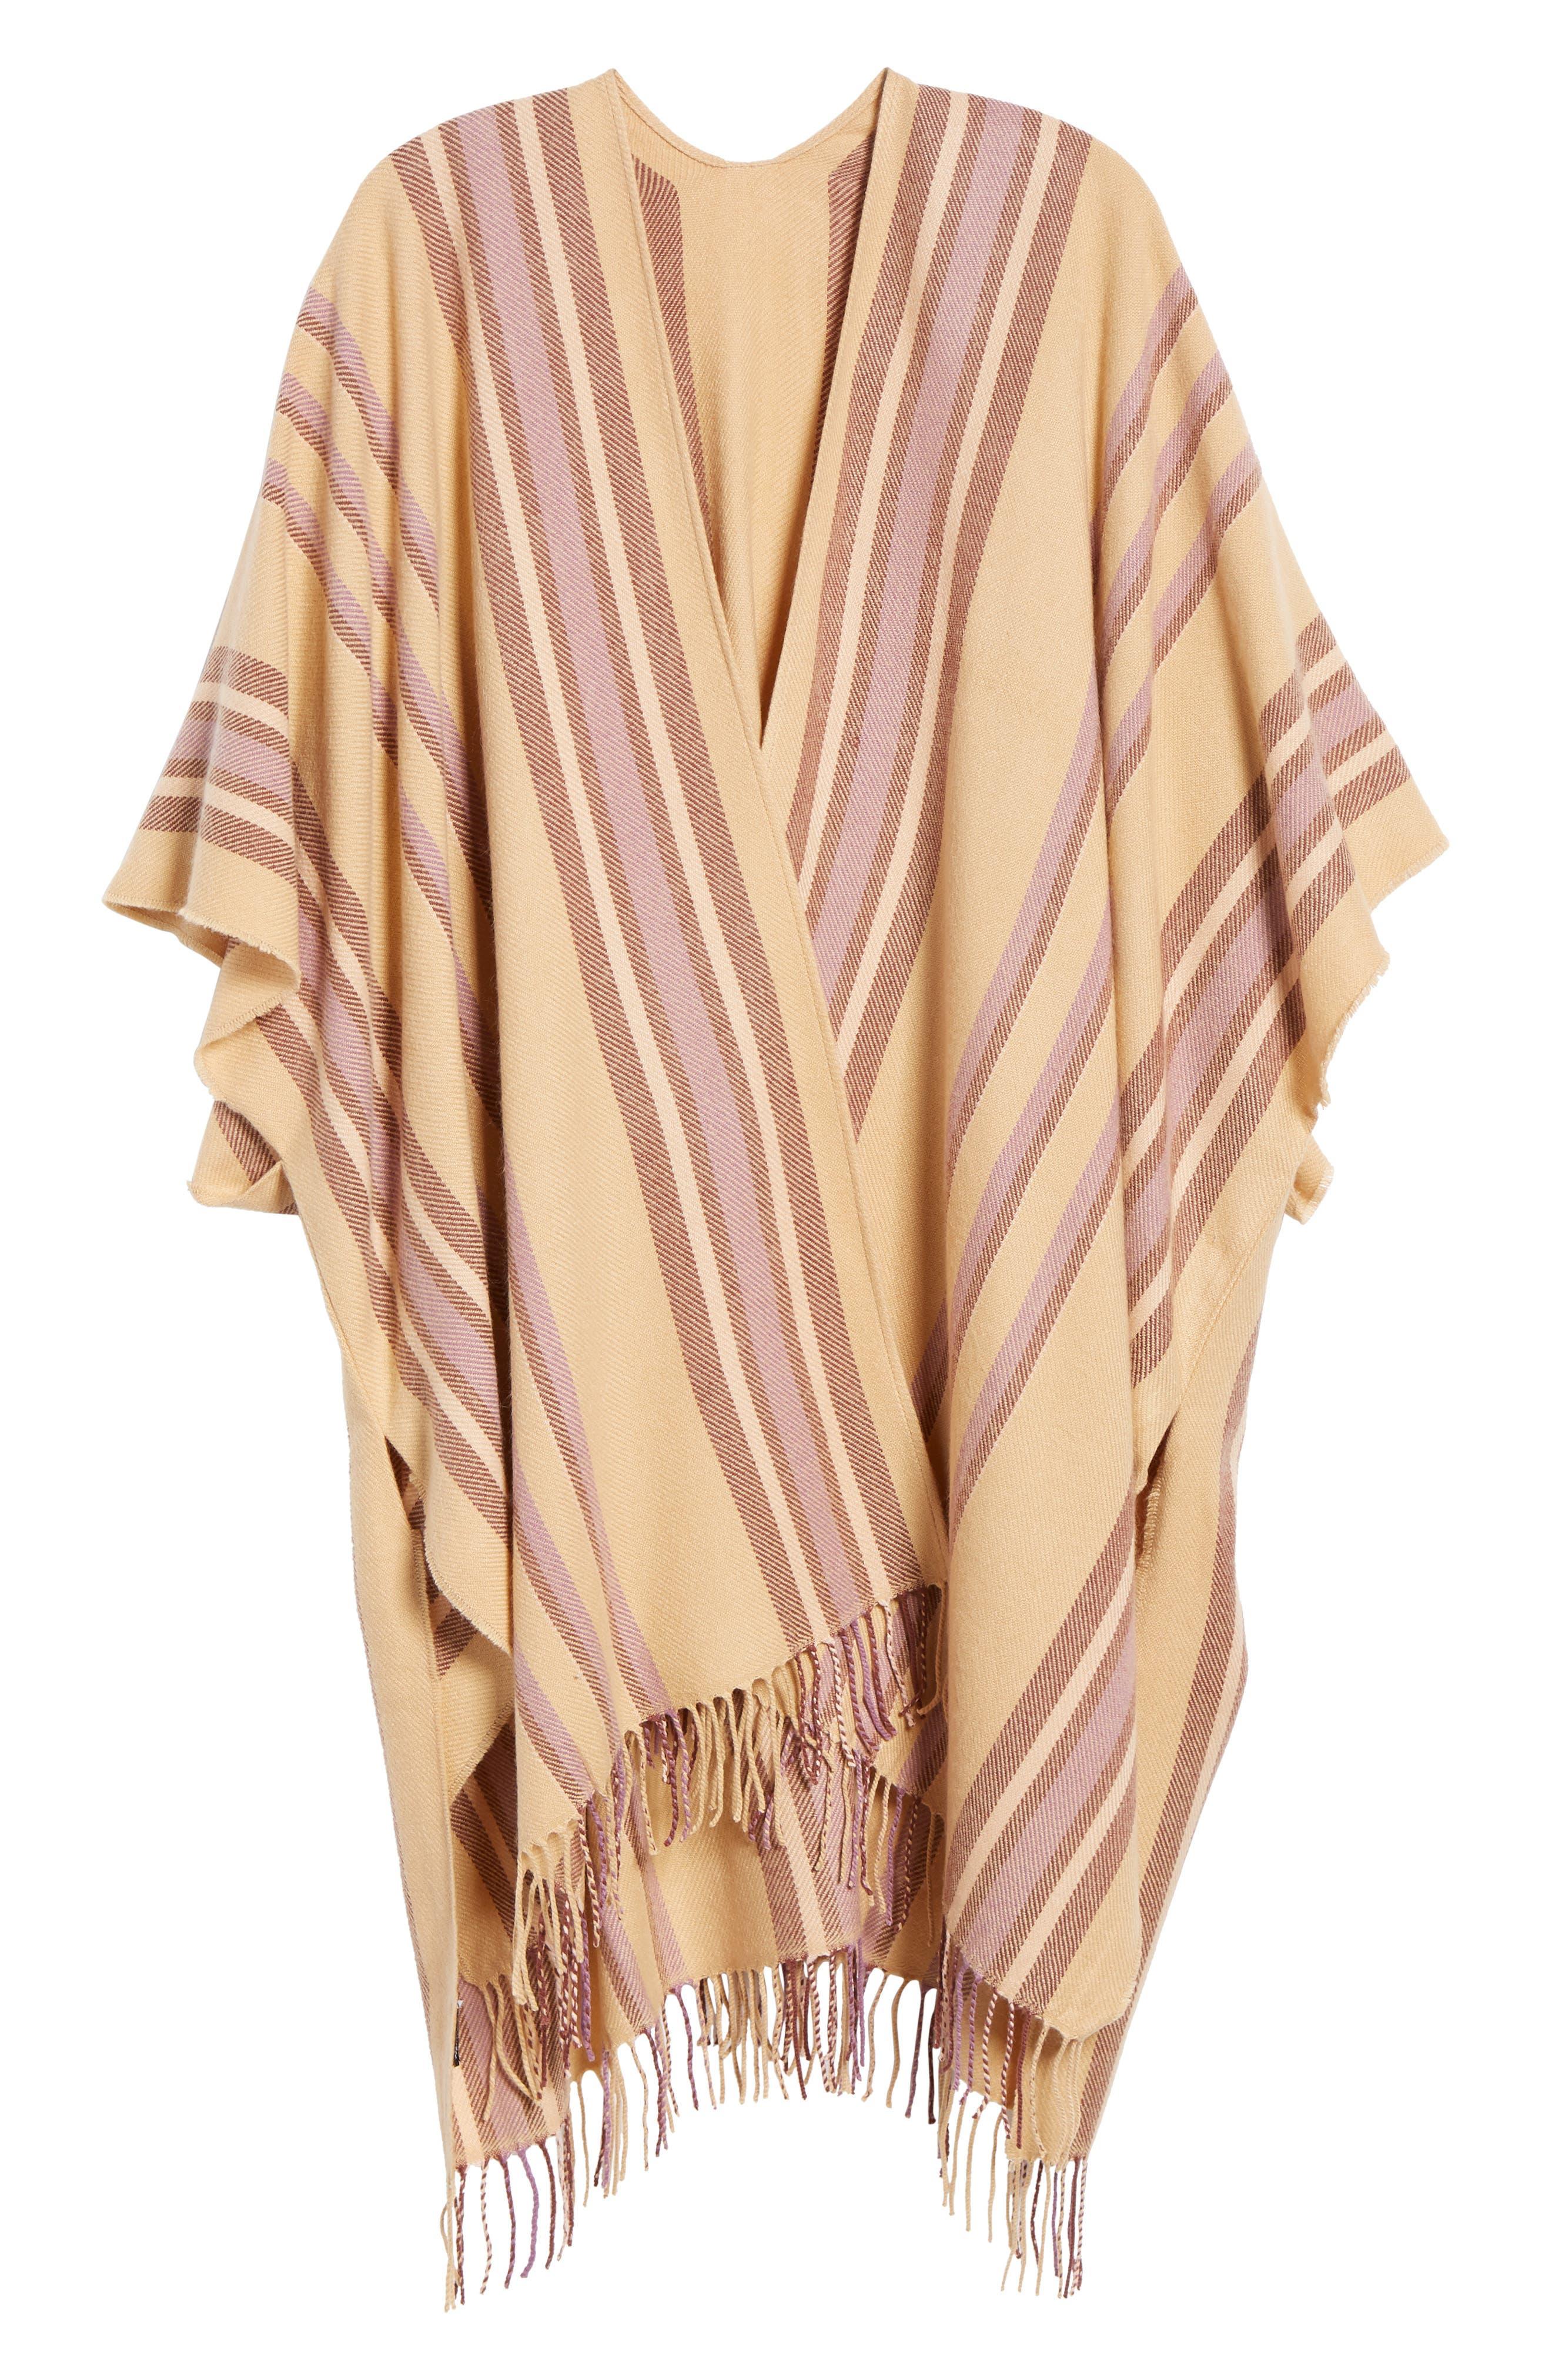 Placed Stripe Poncho Scarf,                             Alternate thumbnail 6, color,                             DESERT CAMEL MULTI